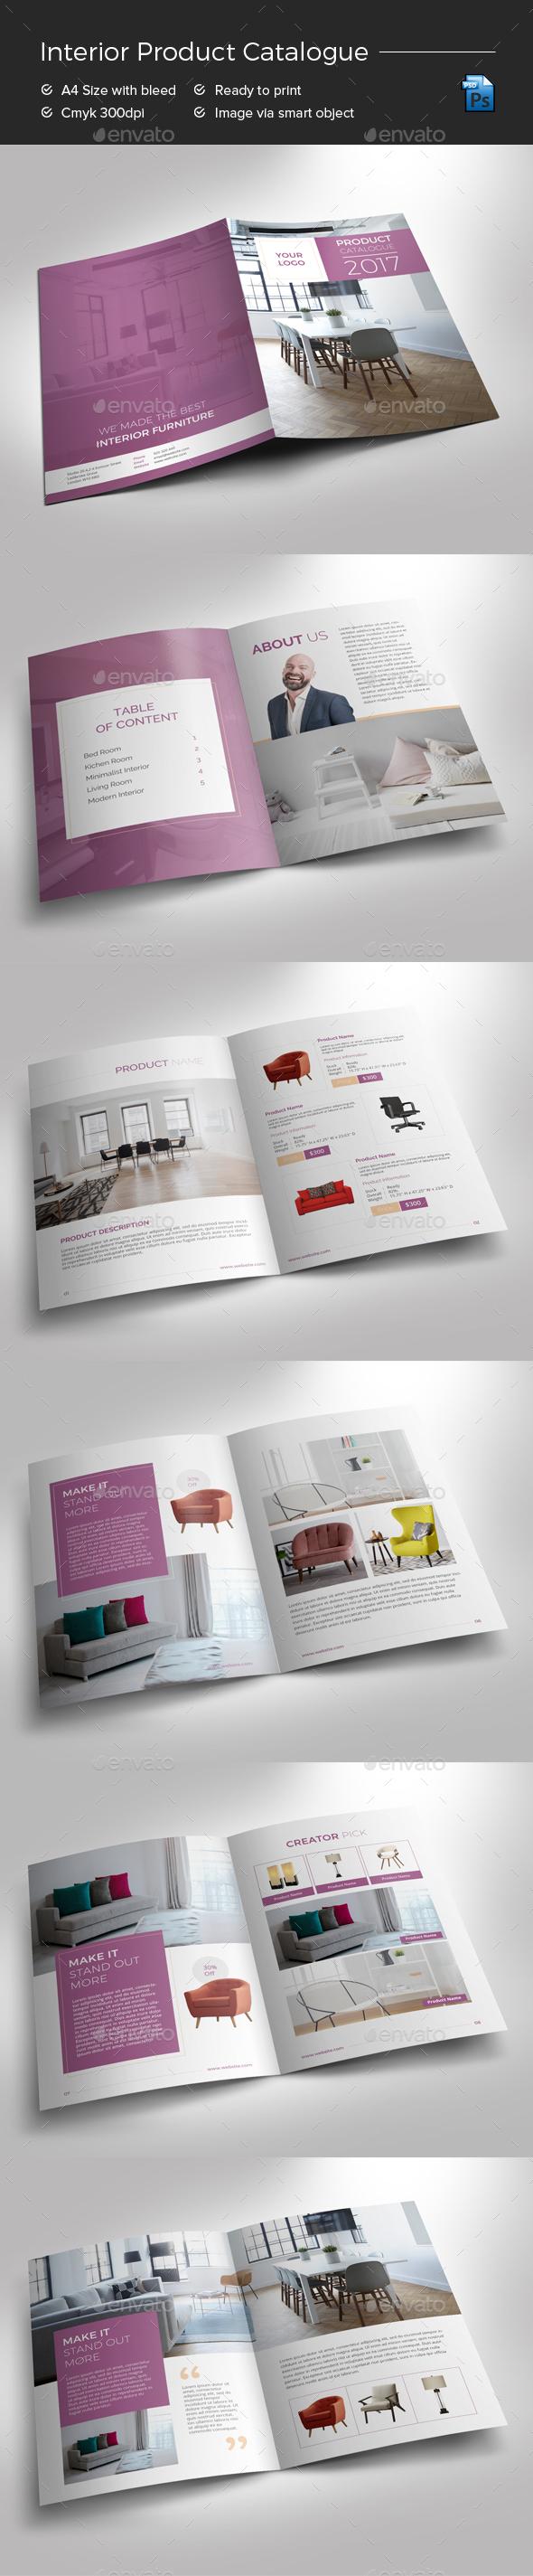 GraphicRiver Interior Product Catalogue 20895092